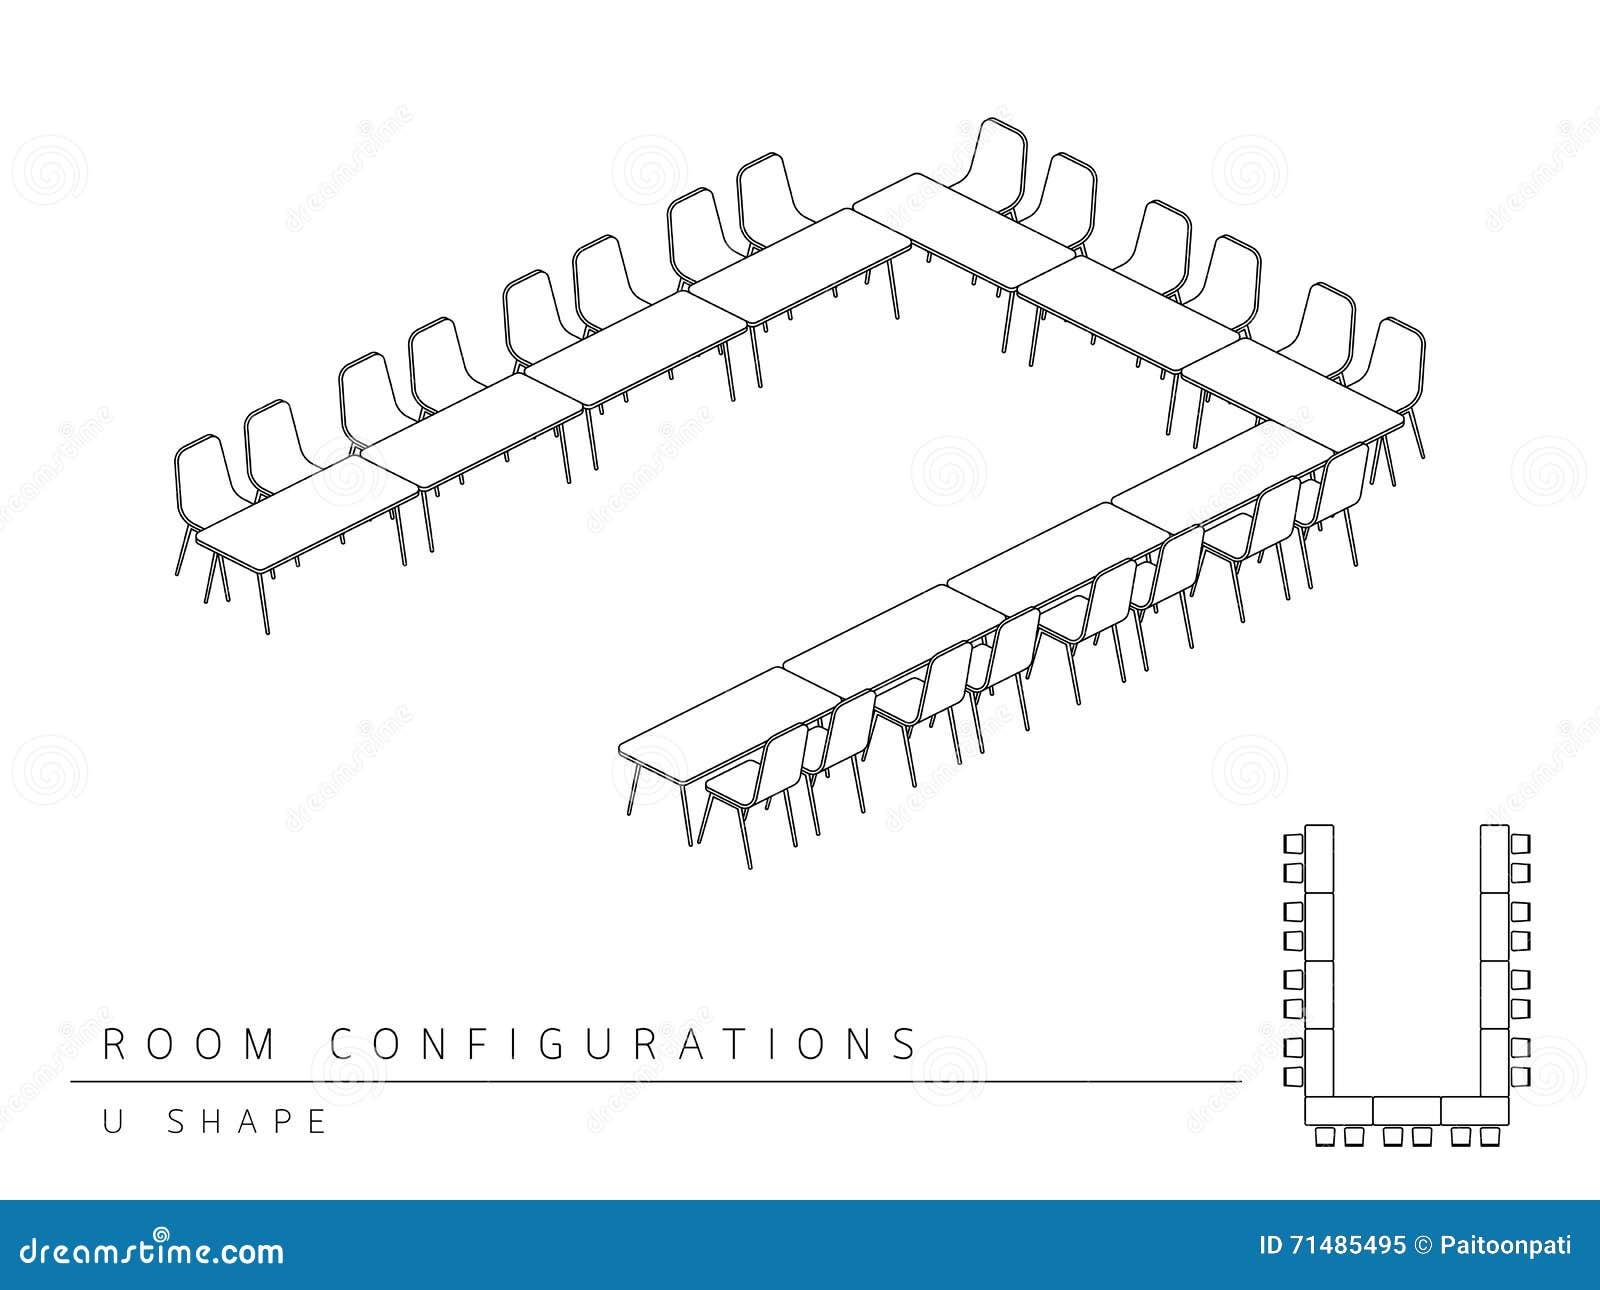 meeting room setup layout configuration u shape style